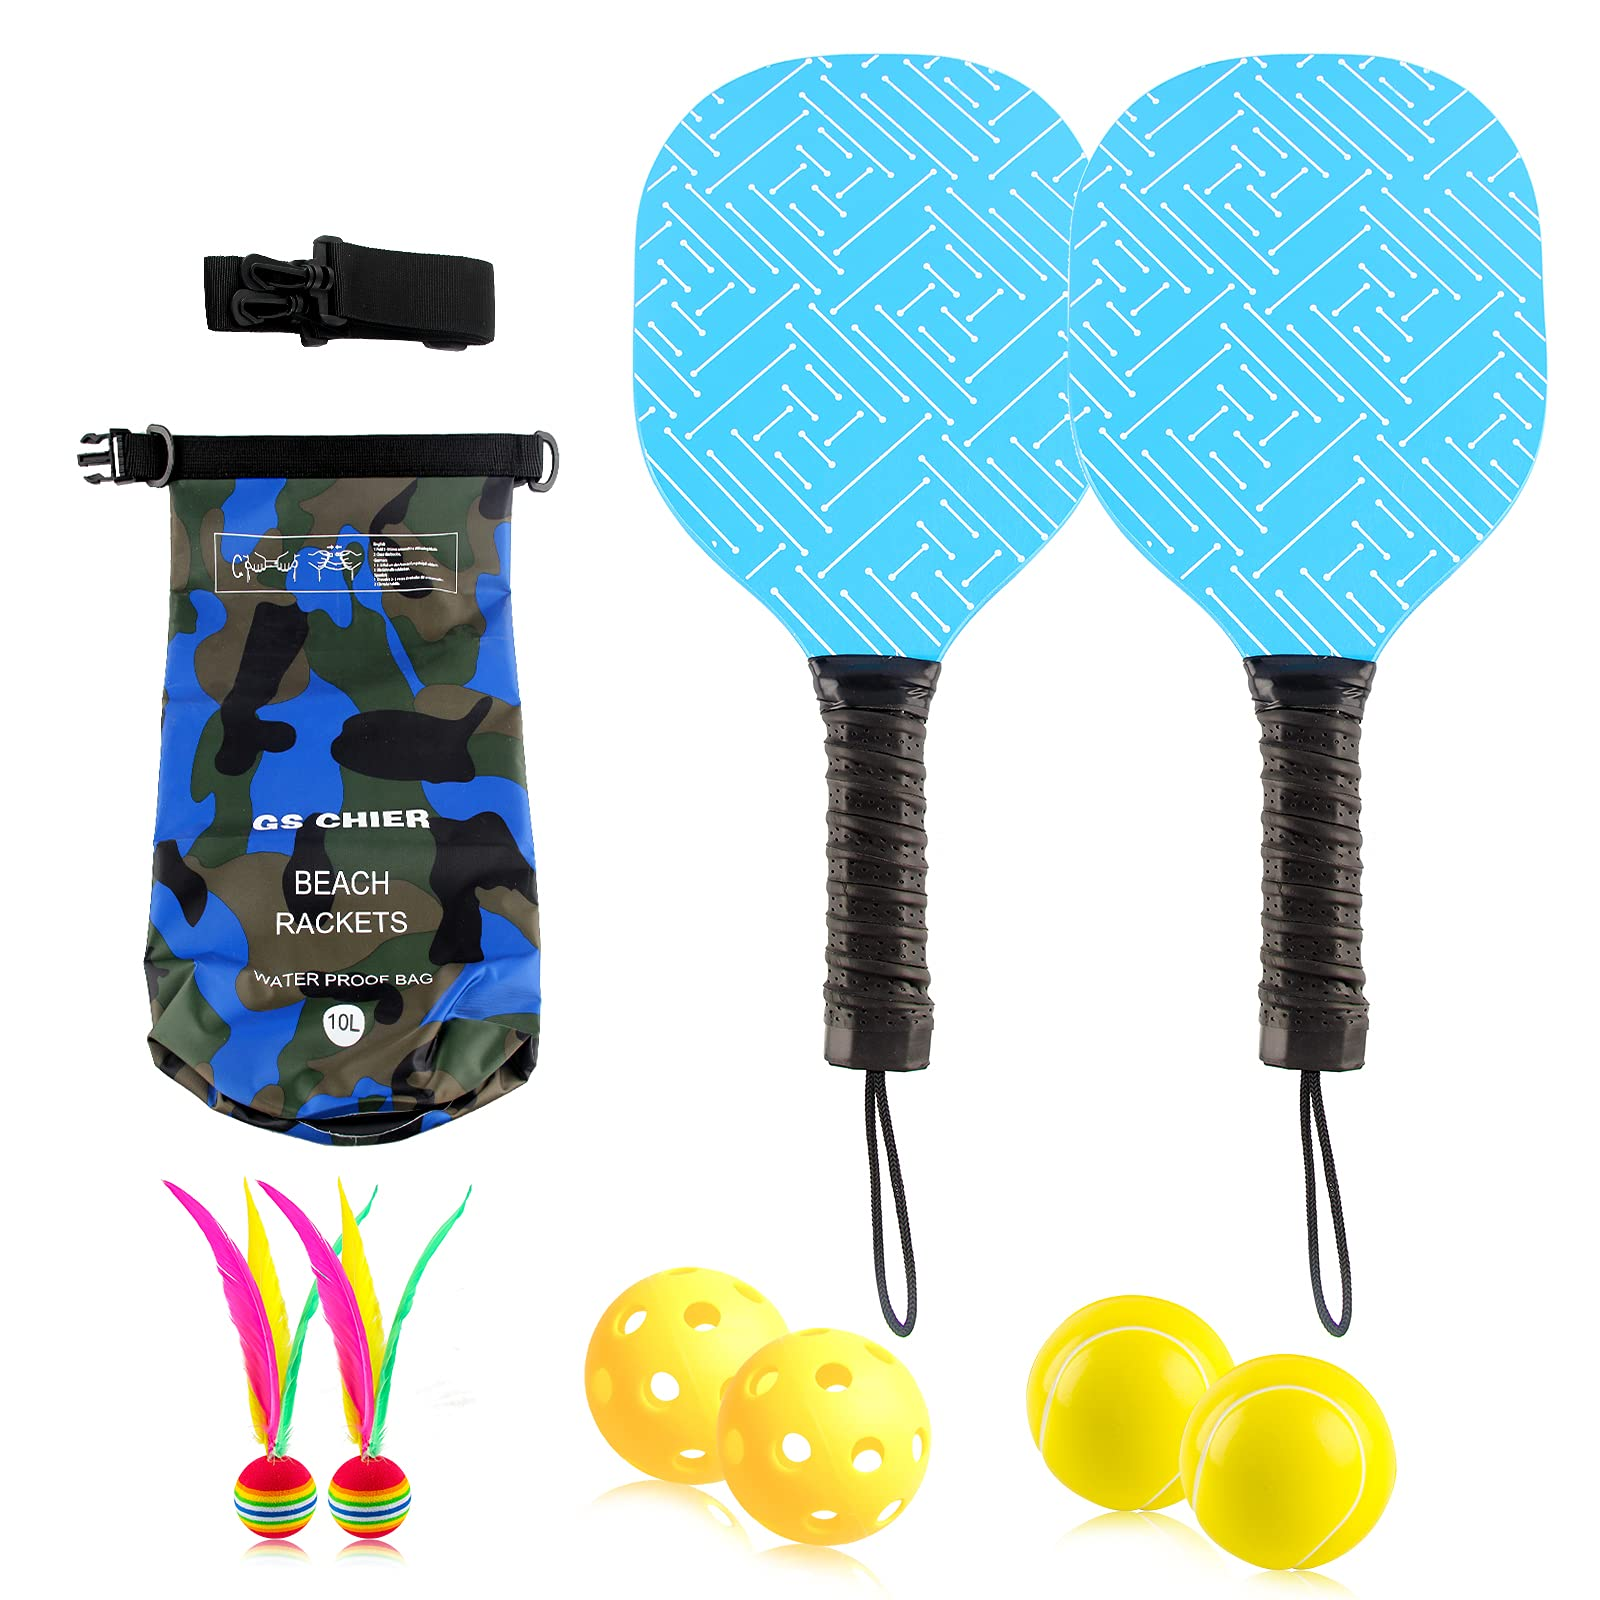 GS CHIER Pickleball Beach Paddle Ball Game Kits for Ki -4TYQ